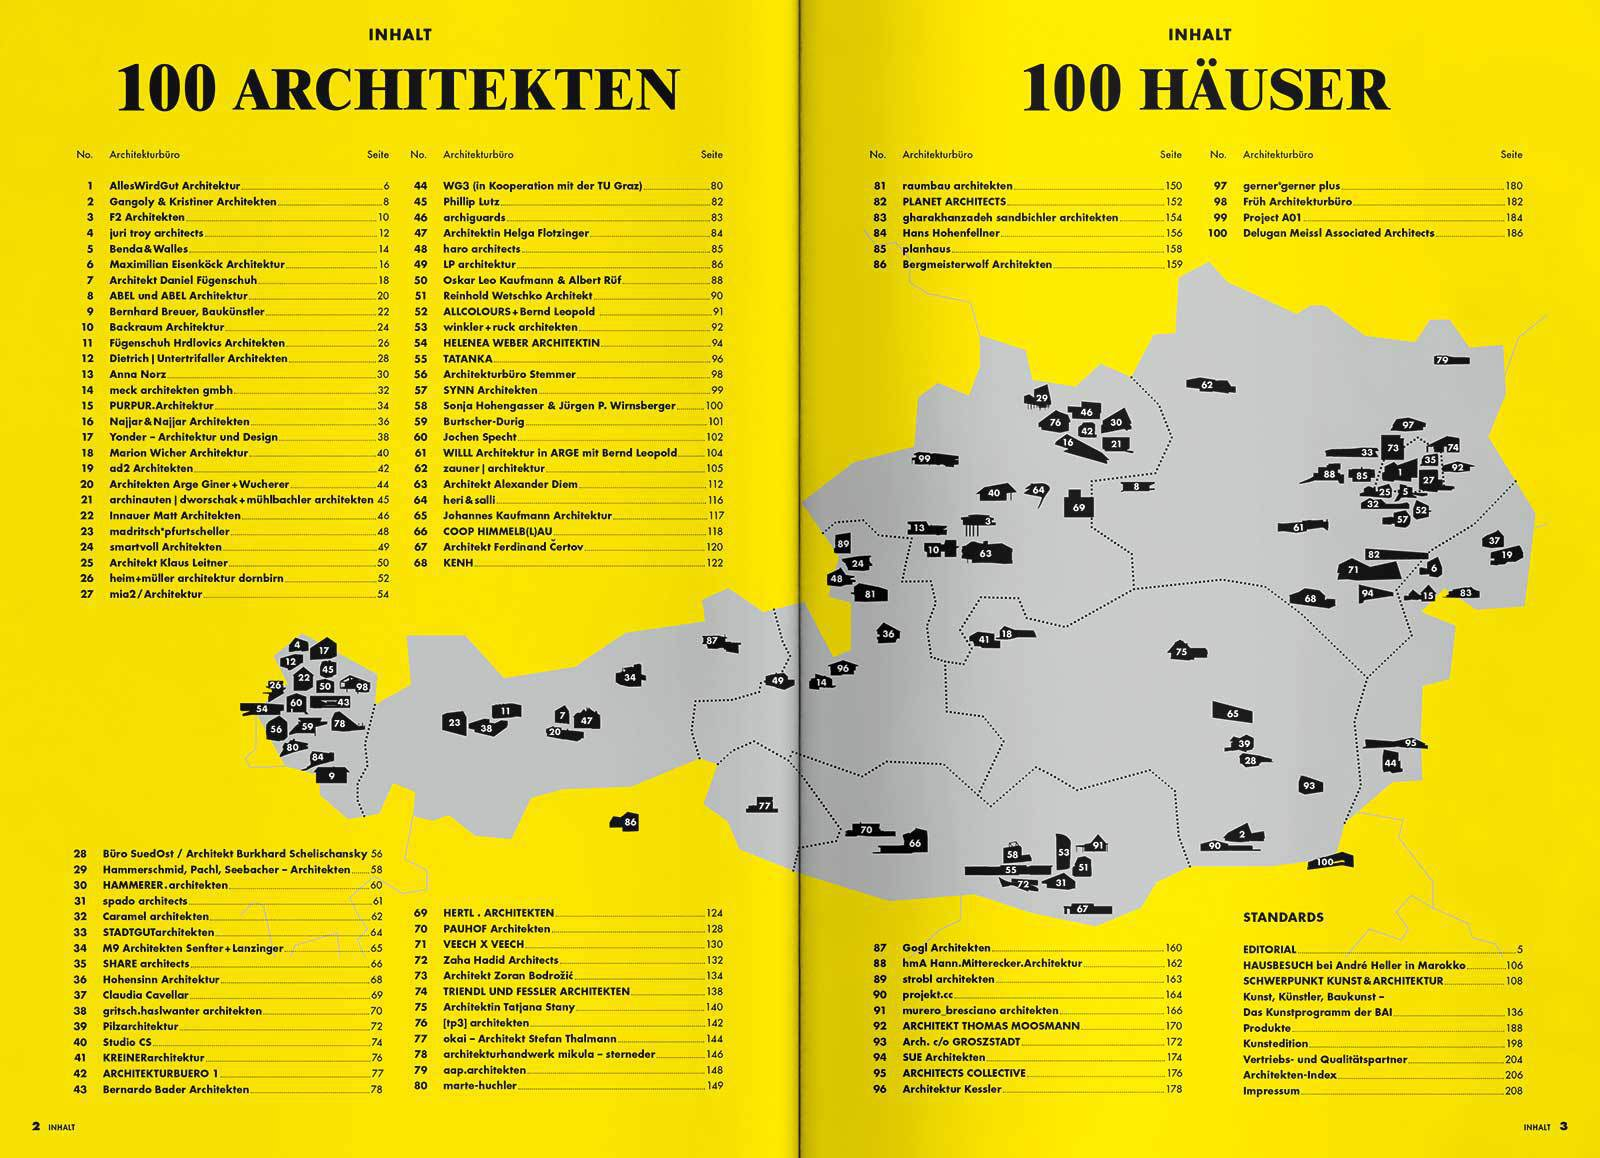 100 AT Haeuser2016 spread02